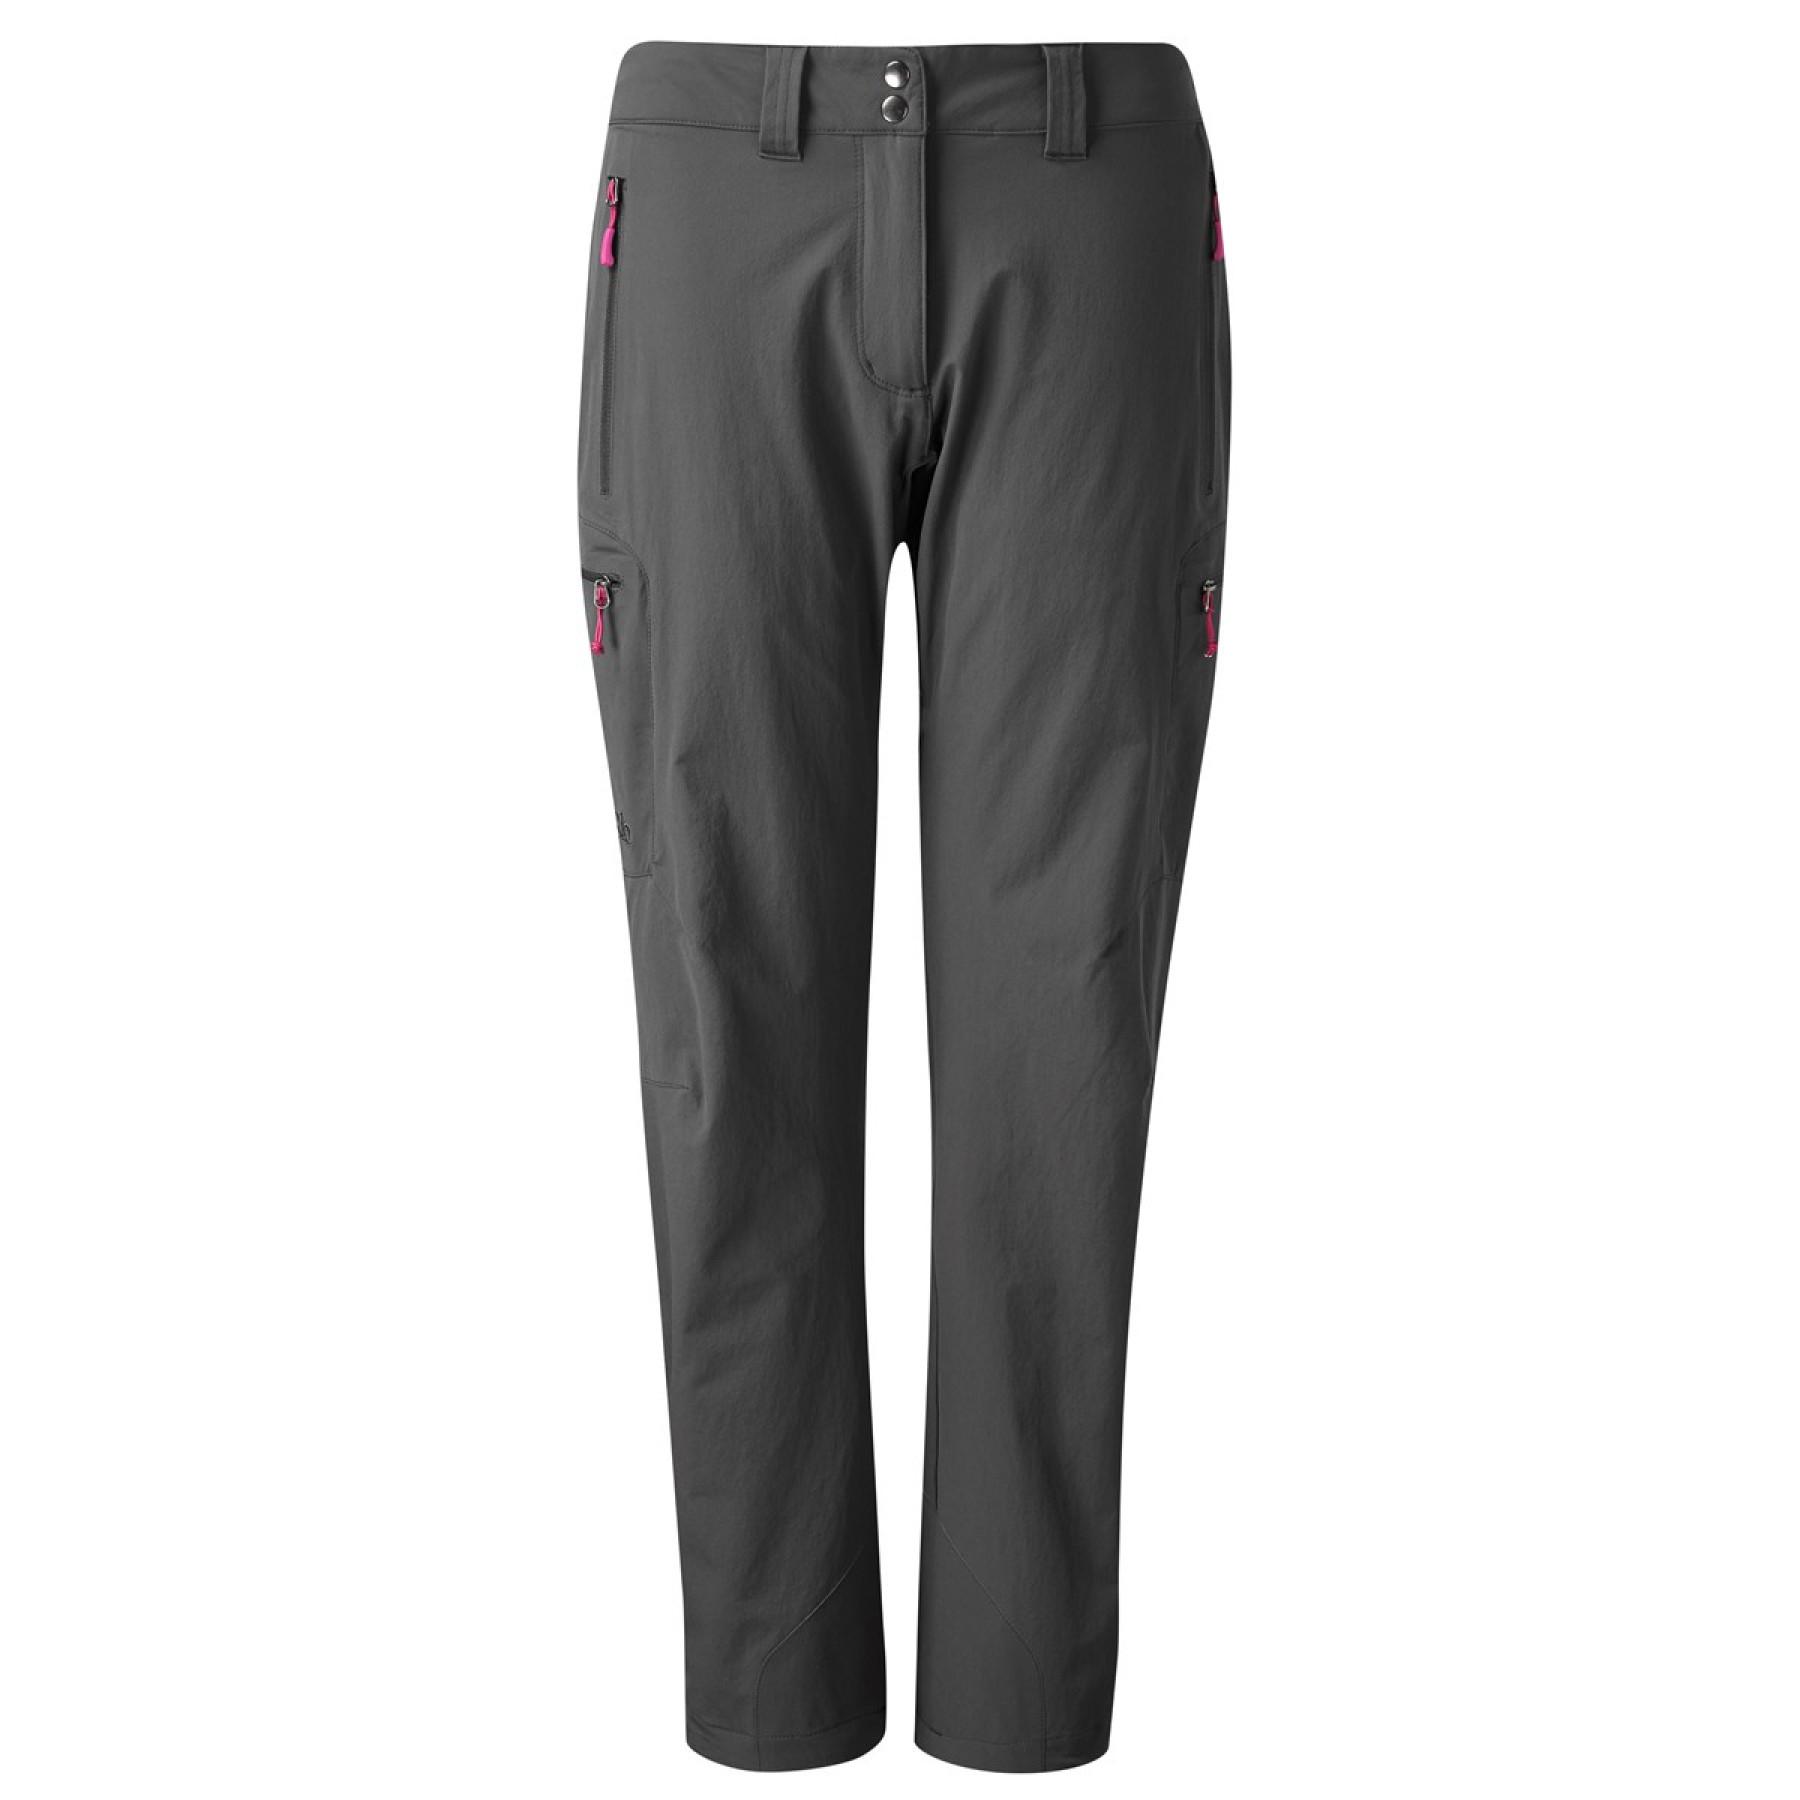 8b263f1f Rab Sawtooth Pants Women's Beluga | Fjellsport.no